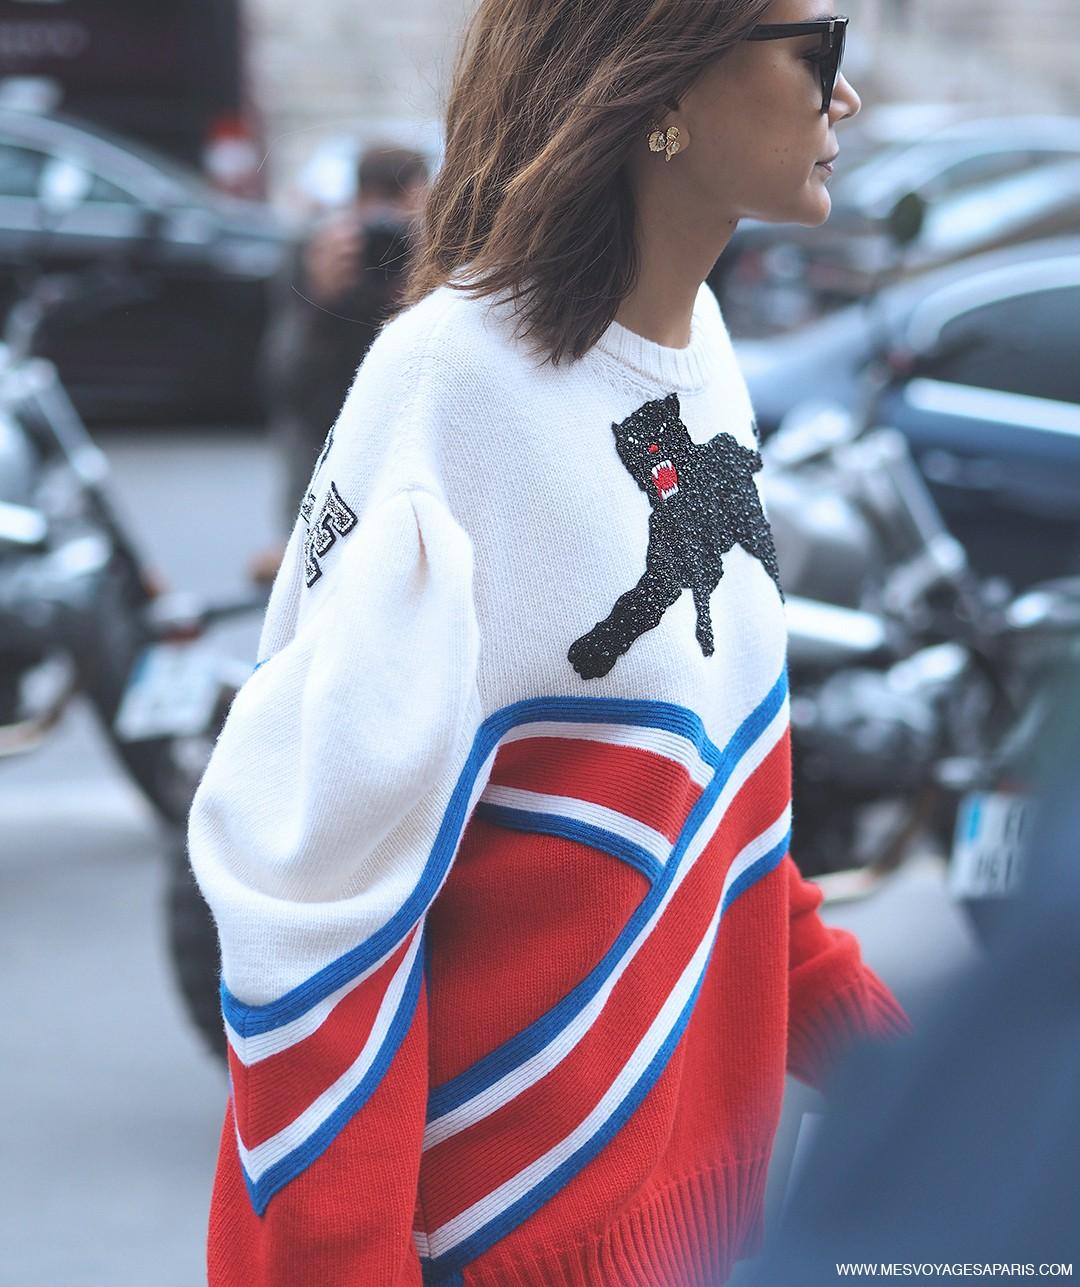 pfw-street-style-september-2016-sept-paris-fashion-week-street-style-september-2016pa011223-copia